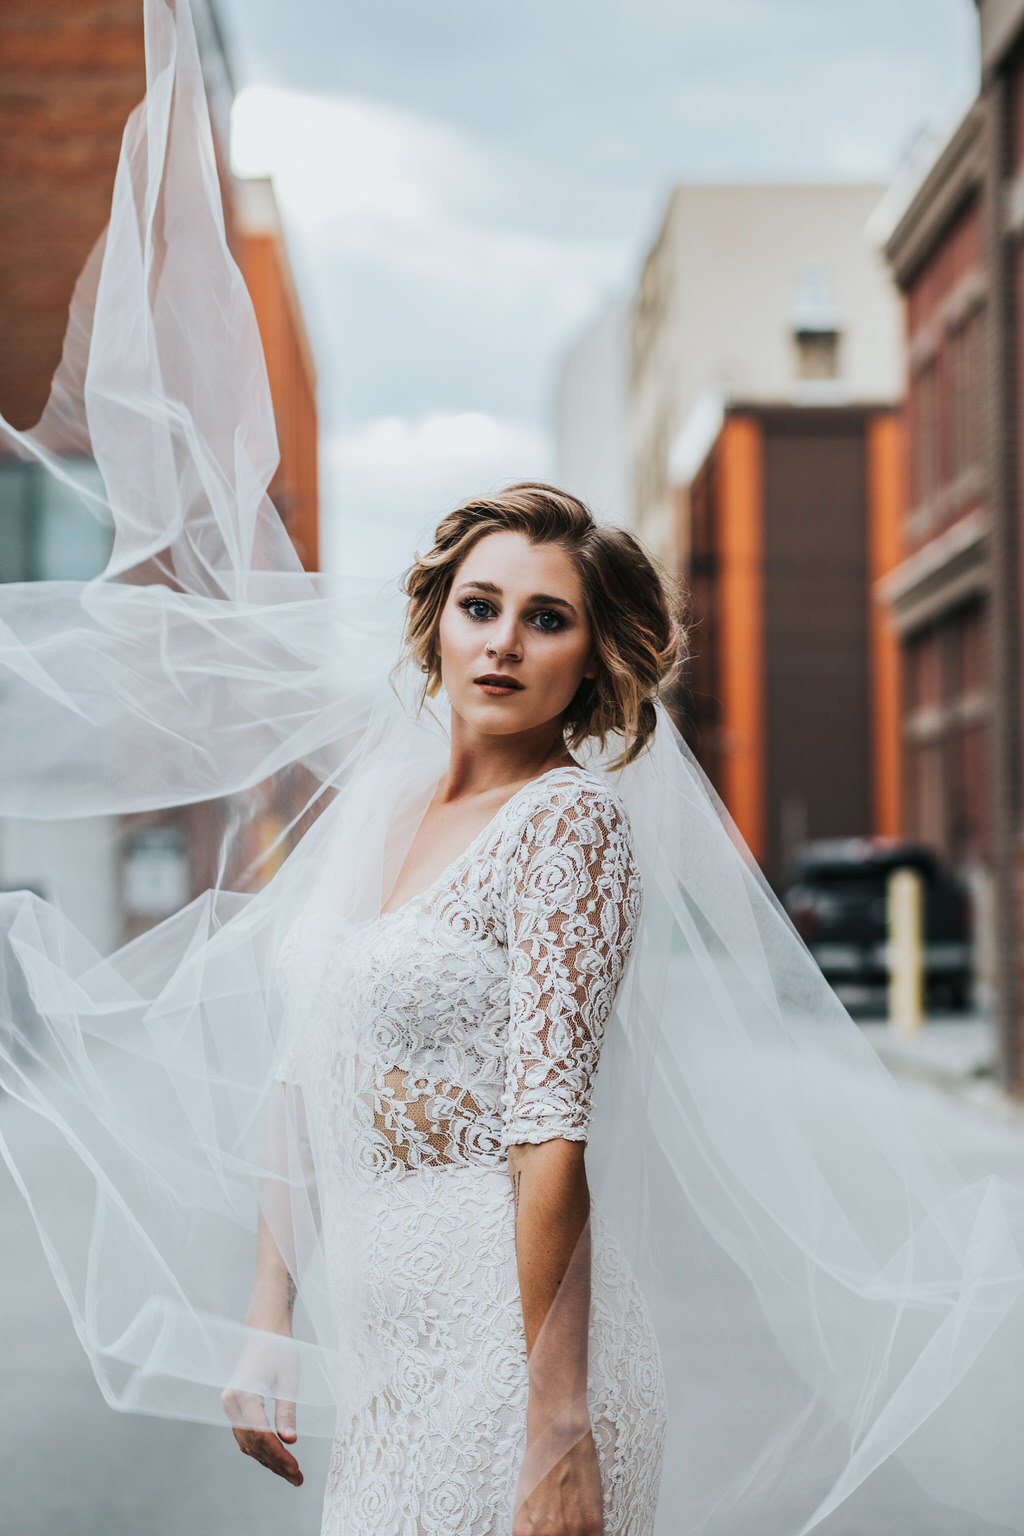 Downtown Calgary Wedding Editorial Portrait of Bride